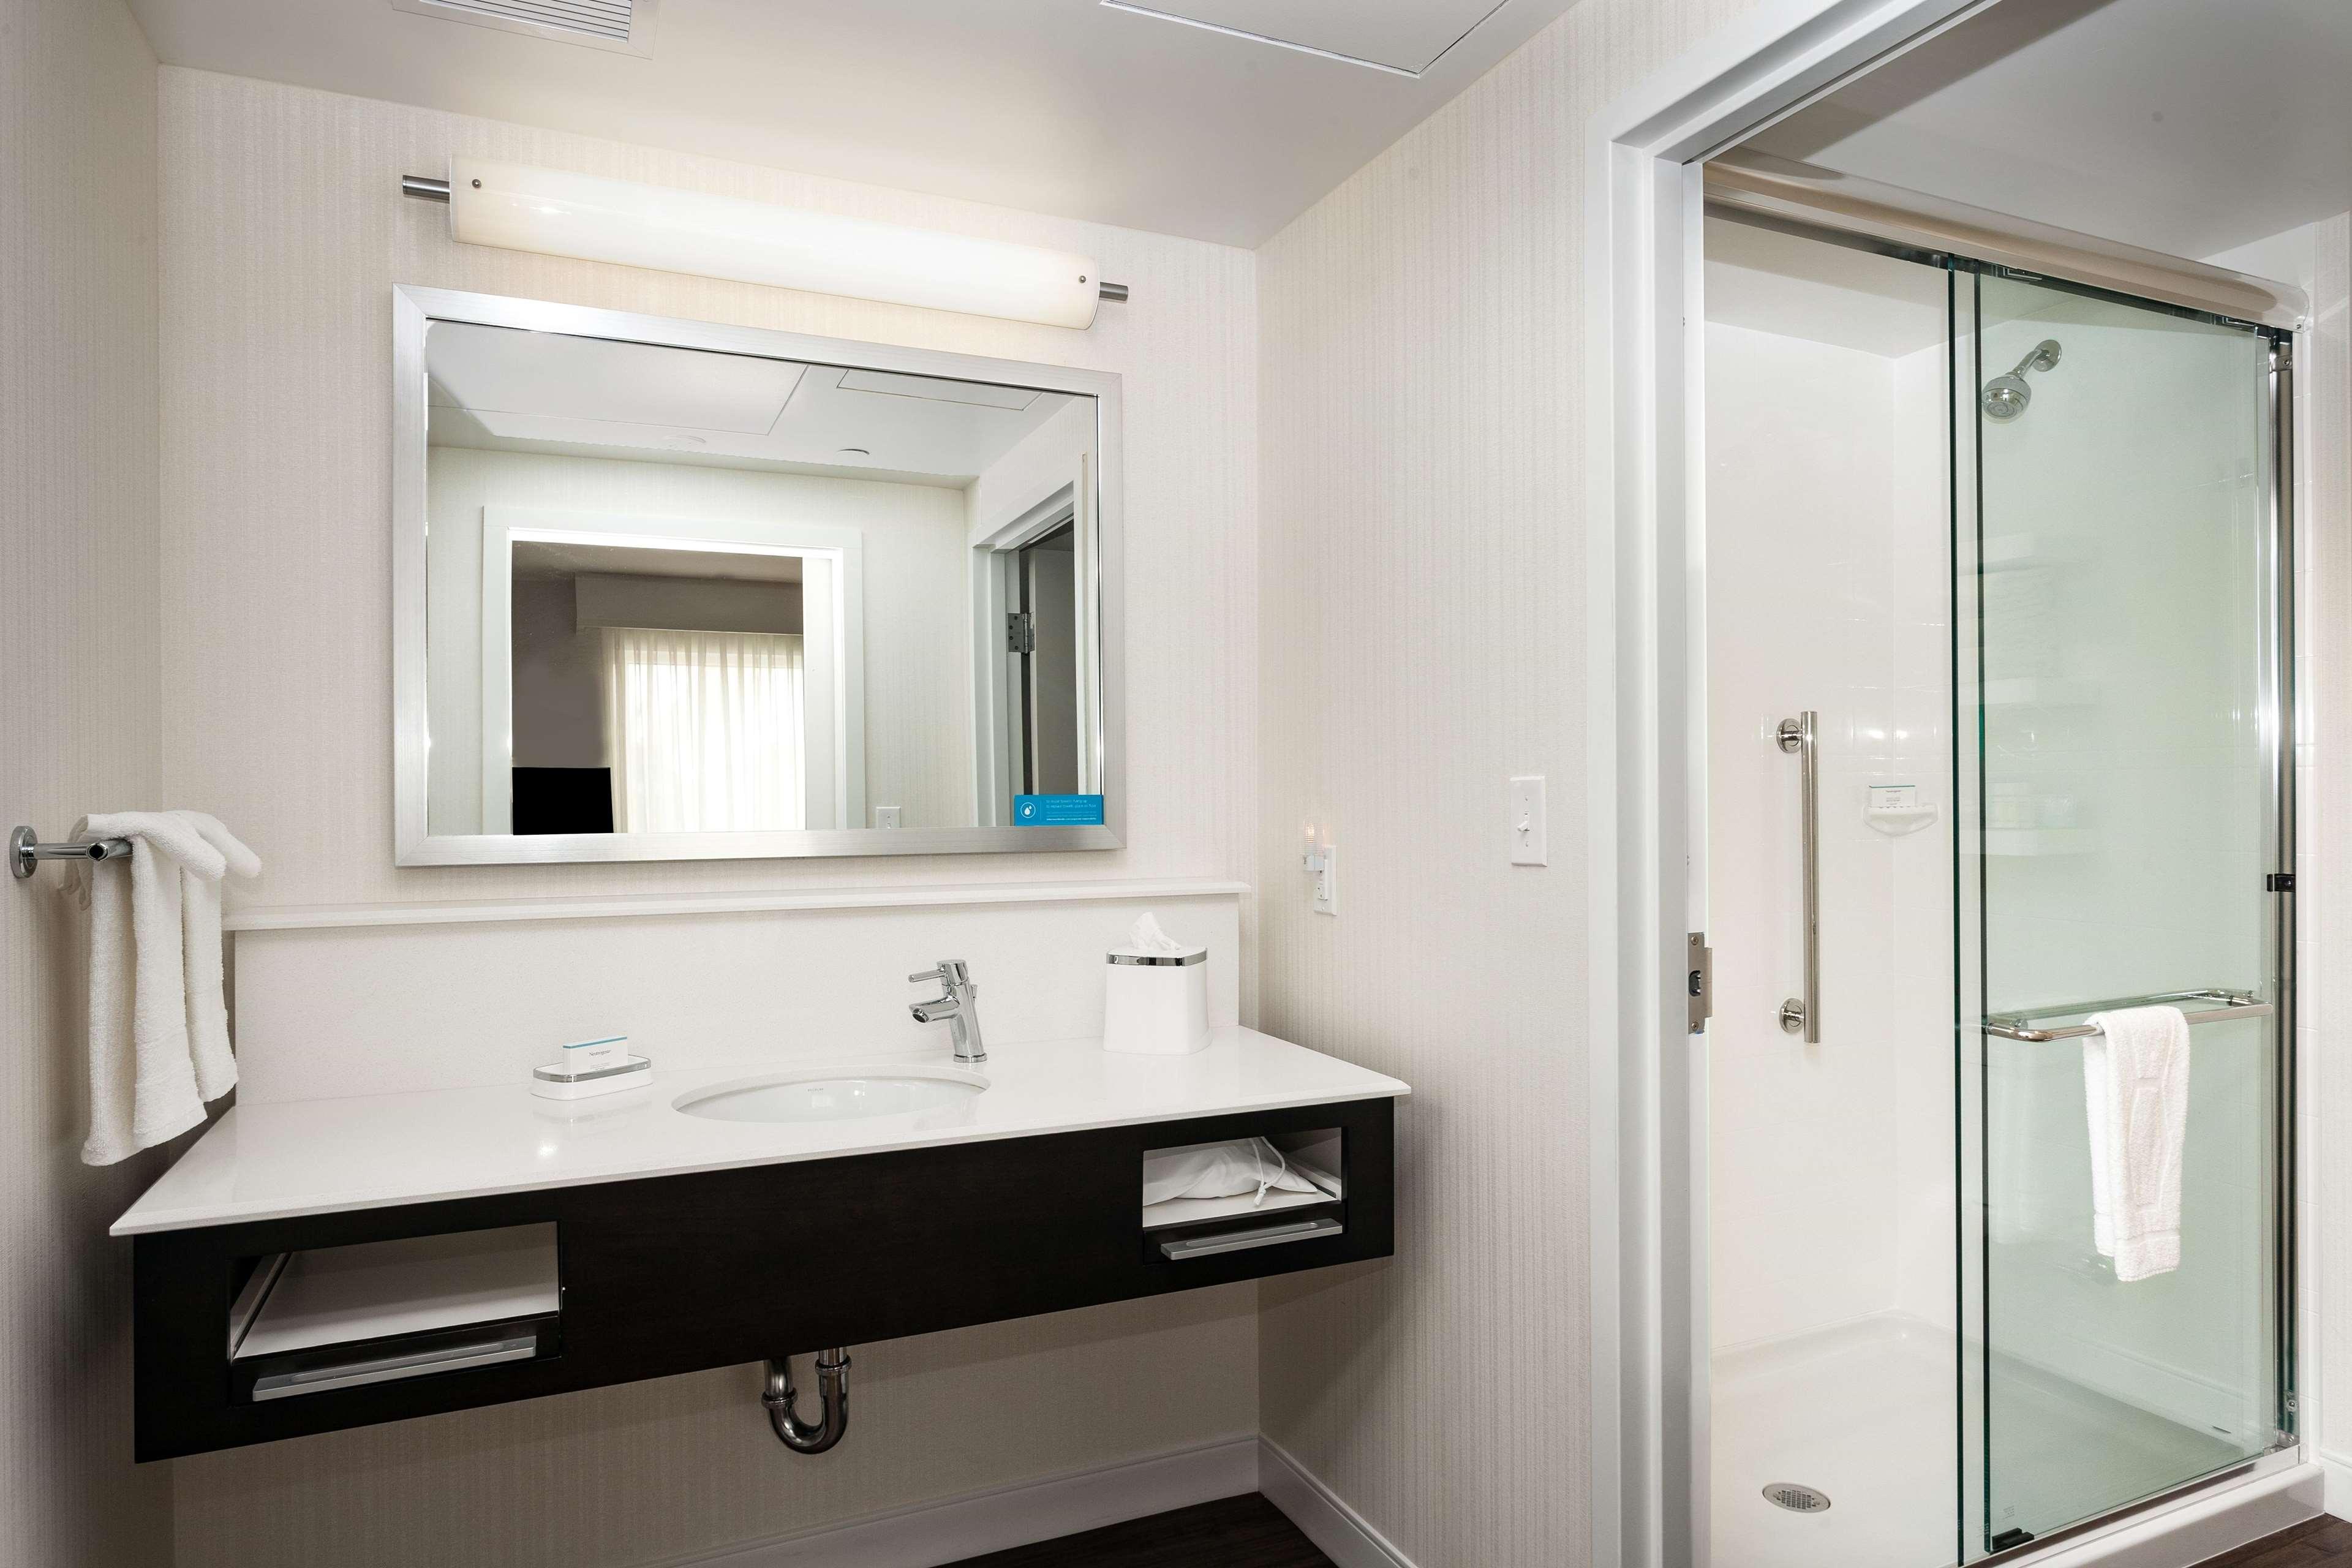 Hampton Inn & Suites by Hilton Seattle/Northgate image 29